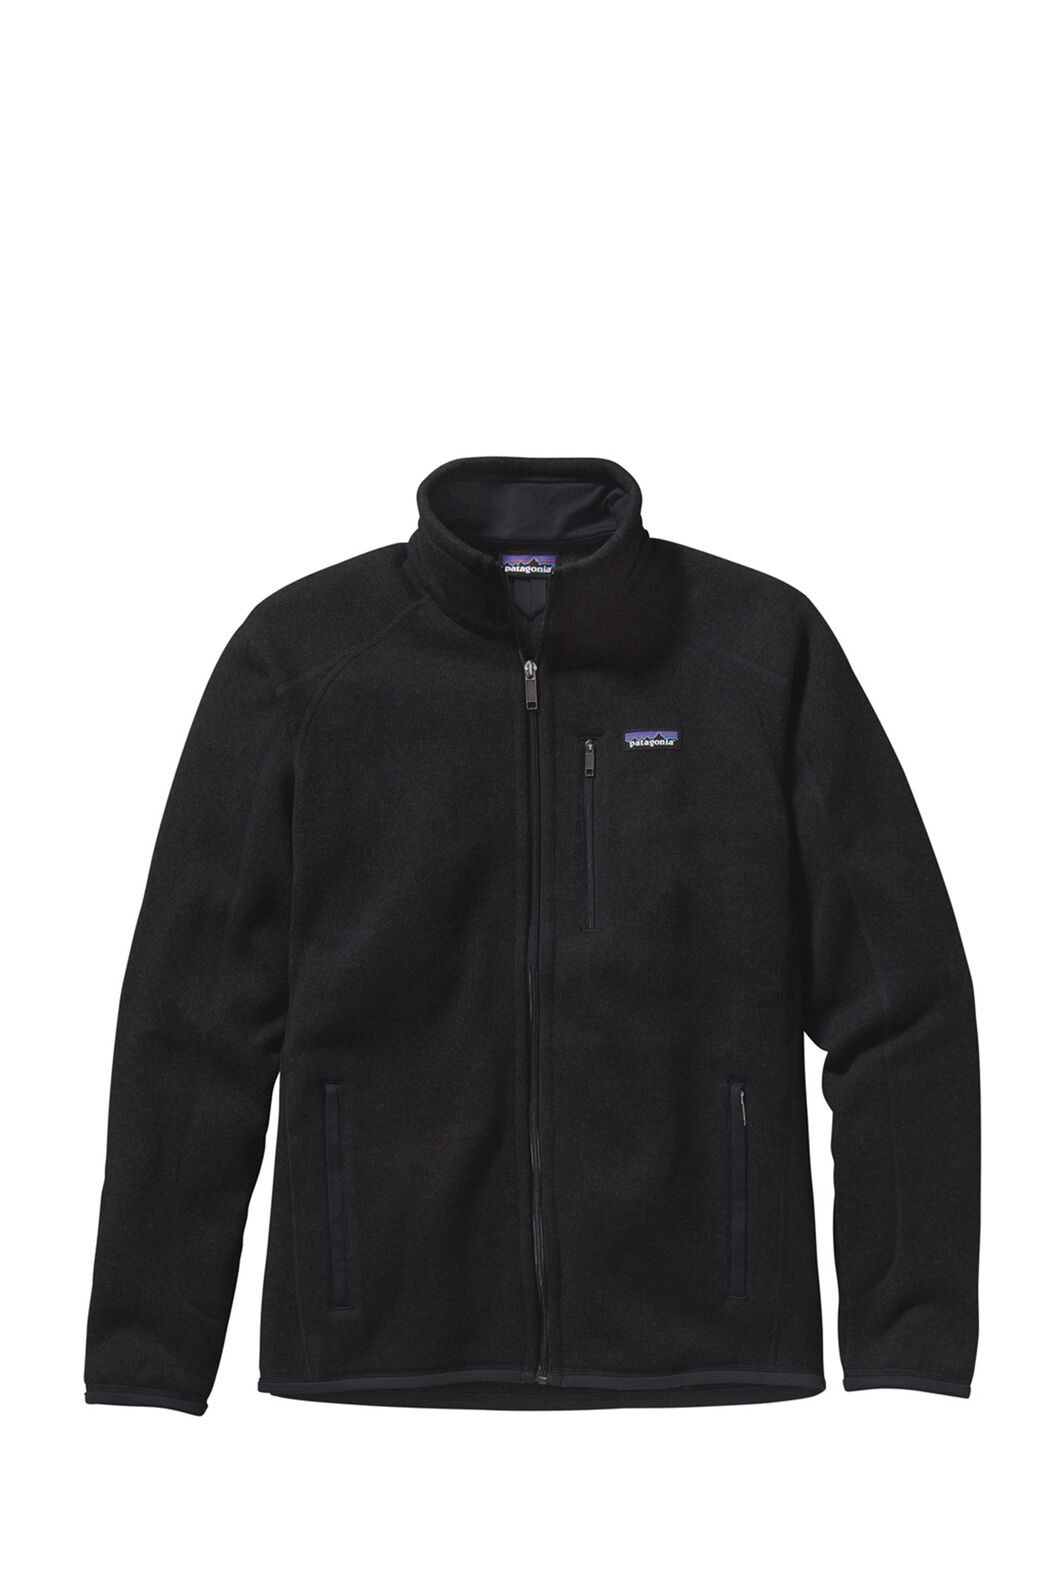 Patagonia Men's Better Sweater Jacket, Black, hi-res